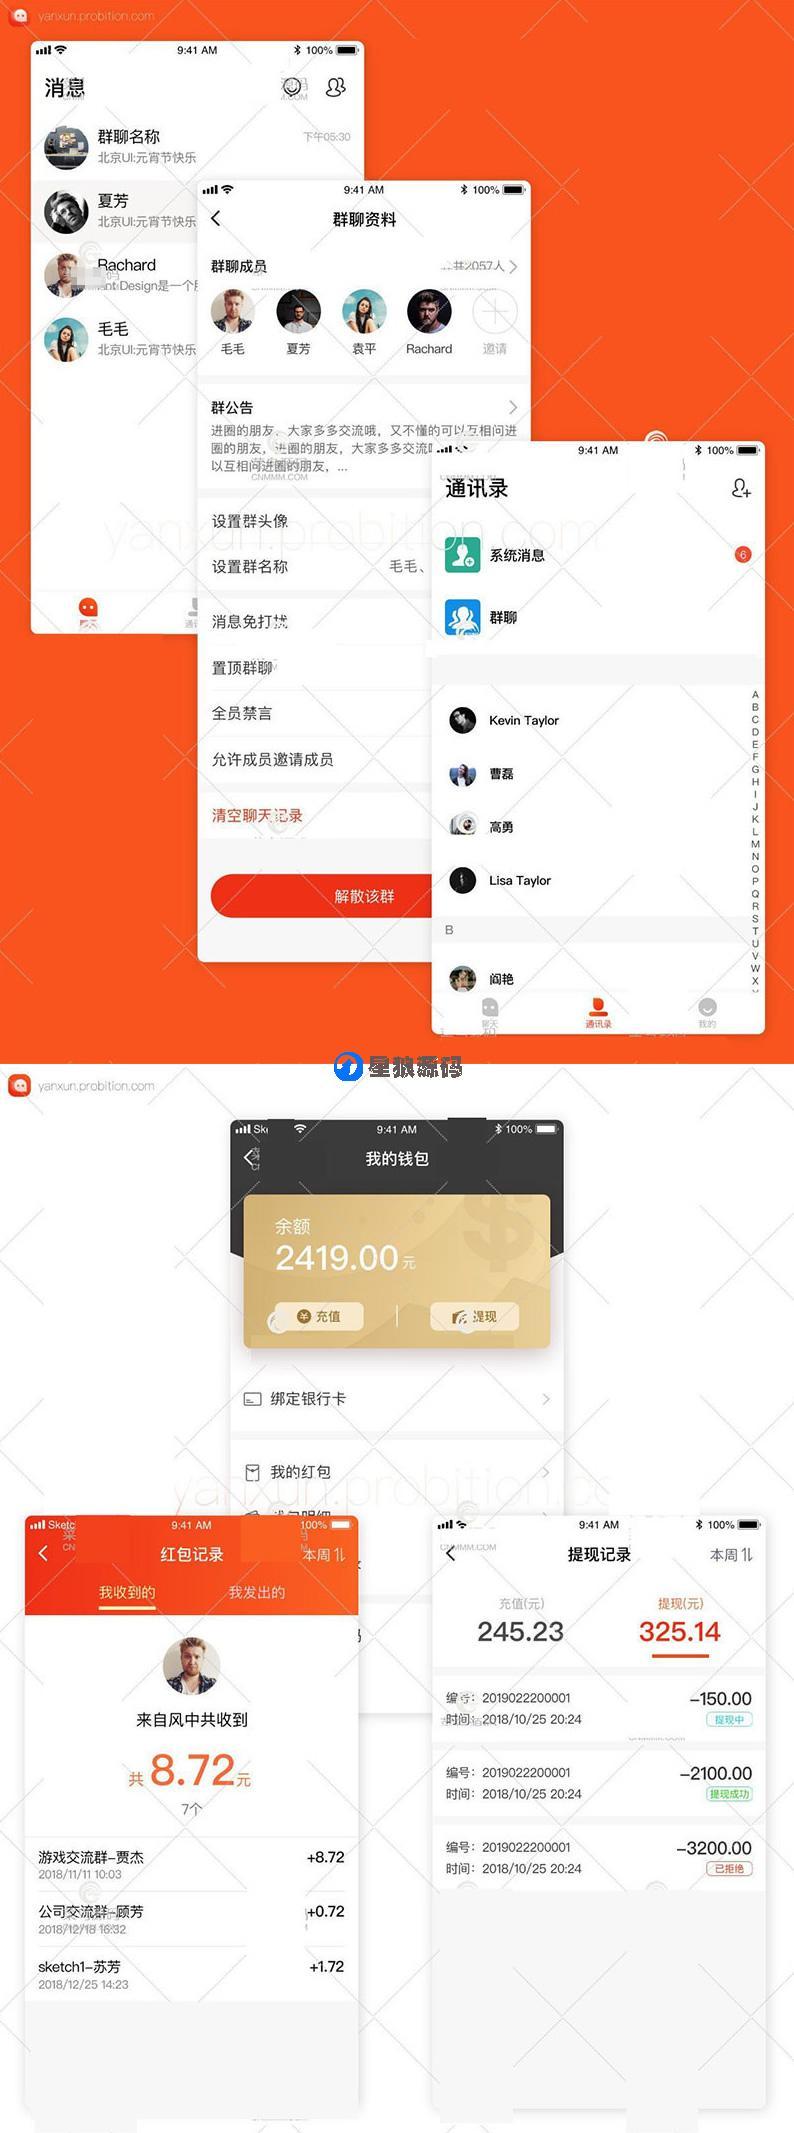 app双端源码即时聊天通讯软件安卓+ios双端原生源码 第1张